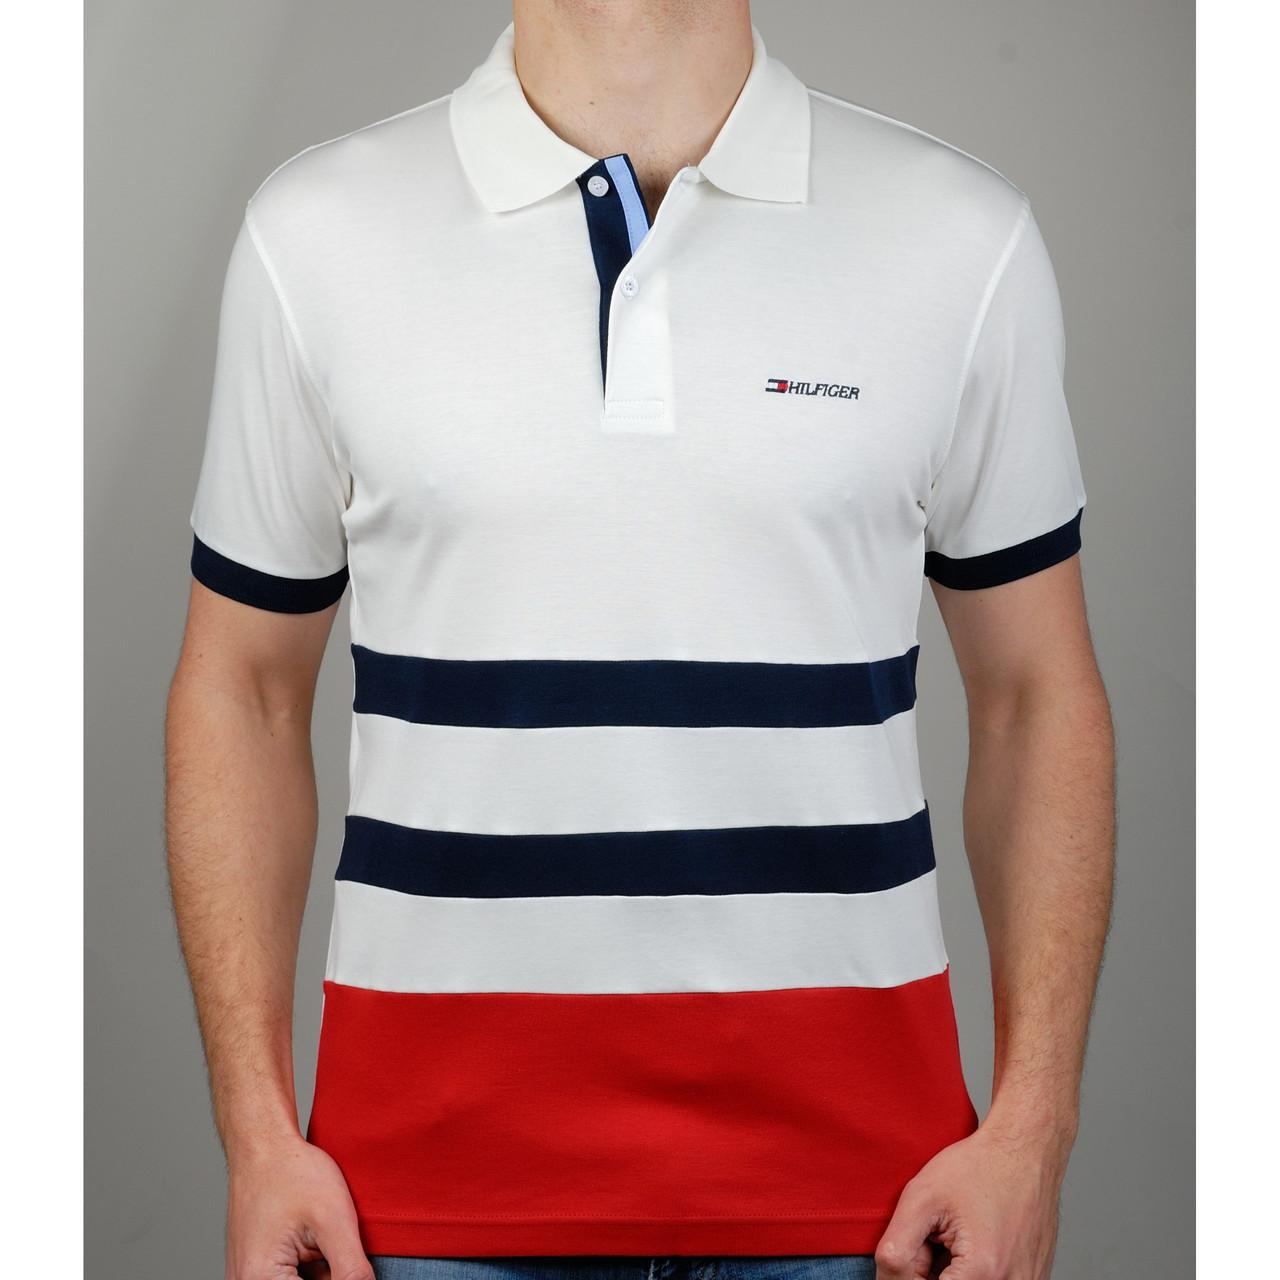 Мужская футболка поло TOMMY HILFIGER 20871 бежевая - купить по ... 6b2b8fa983cee